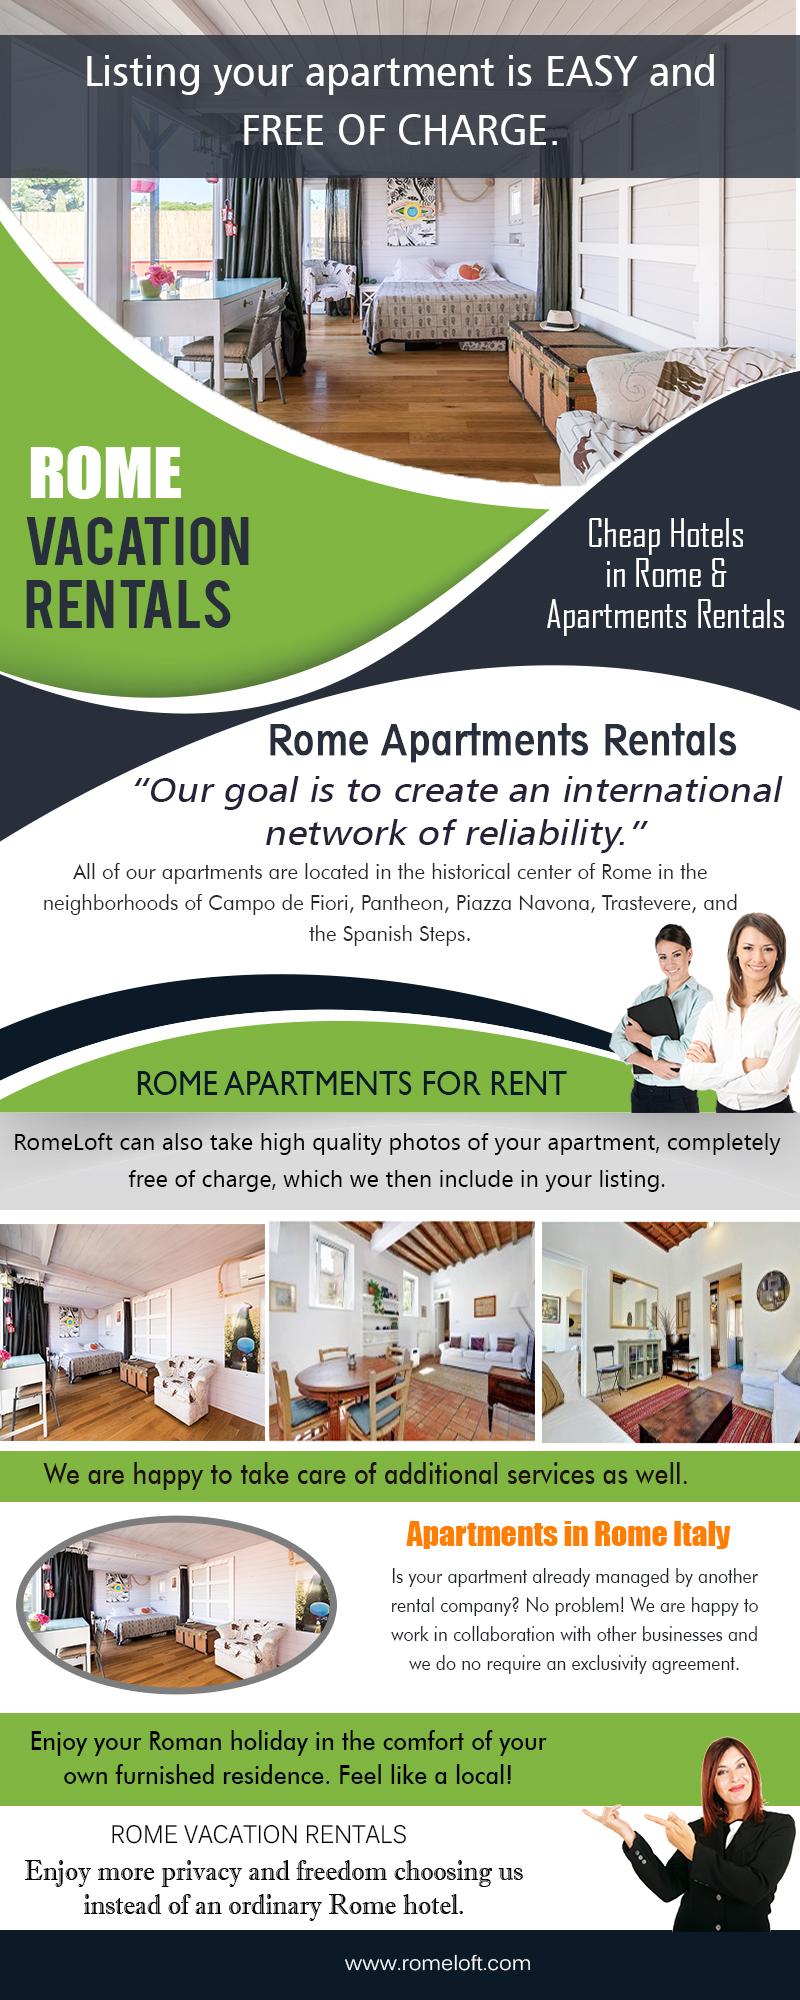 Rome Vacation Rentals